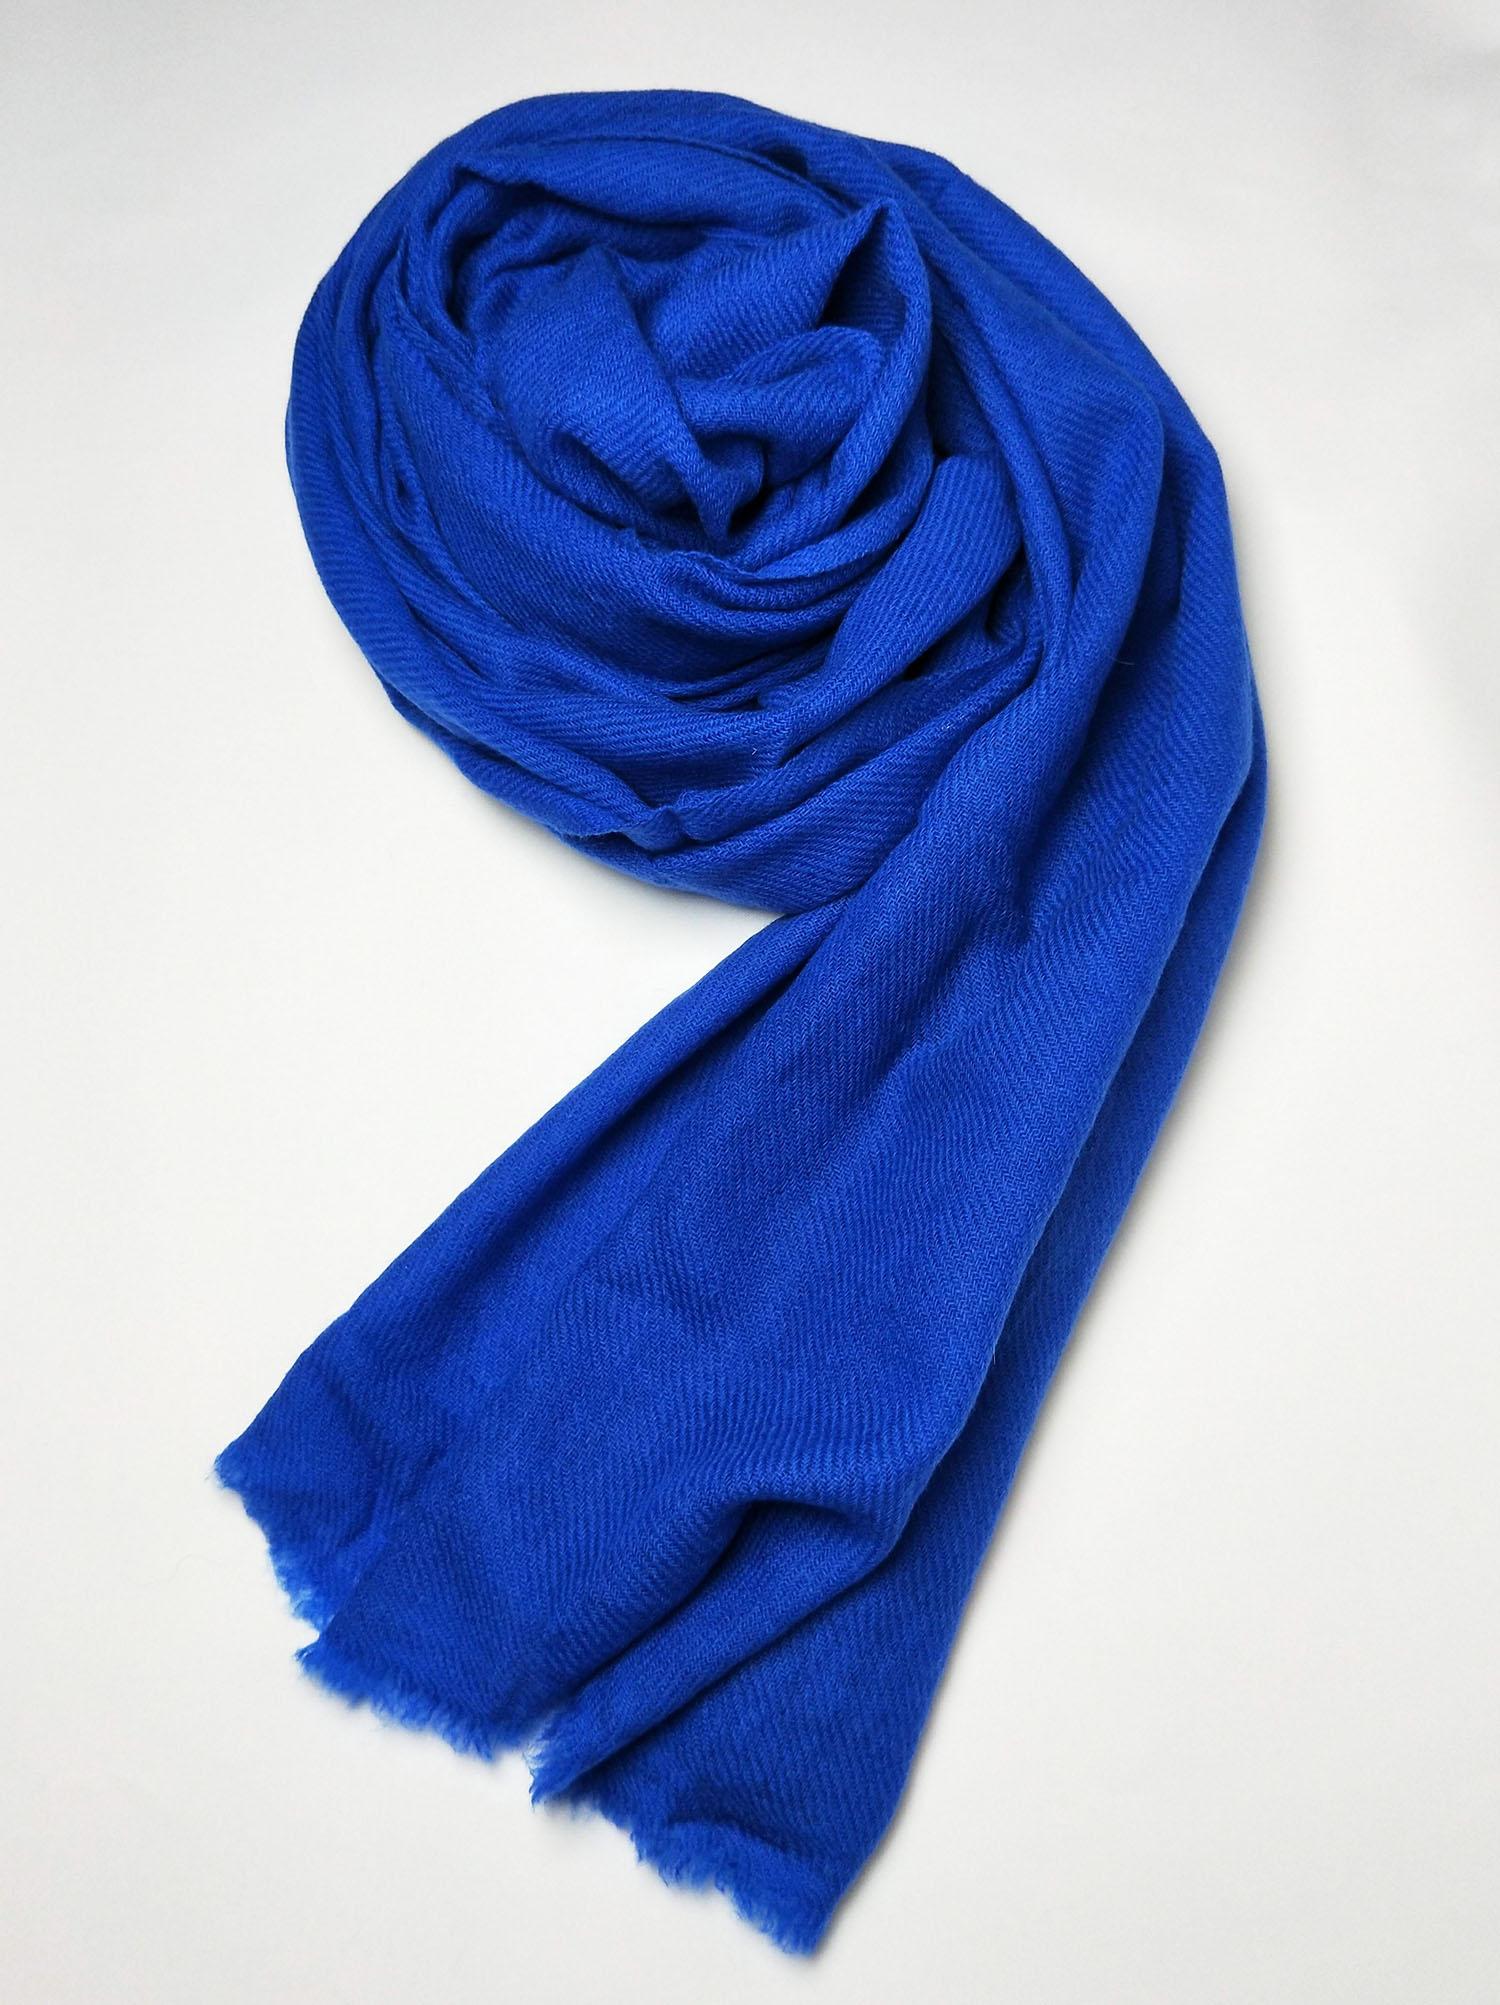 Cashmere Pashmina Shawl- Blue